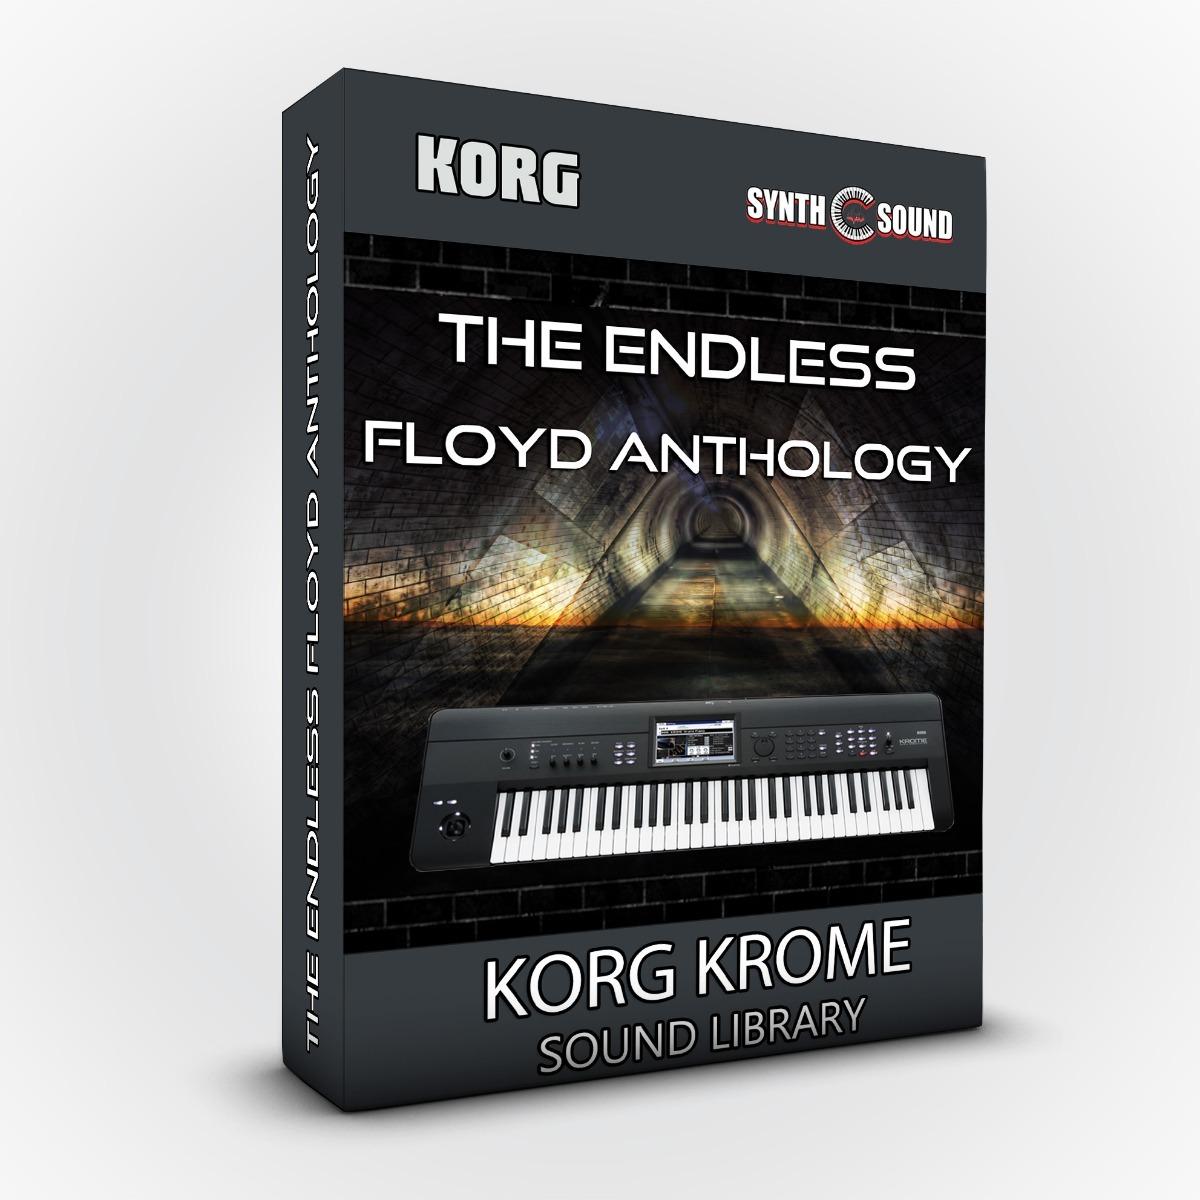 Pack Pink Floyd Libreria De Sonidos Samples Para Korg Krome  - $ 1 750,00